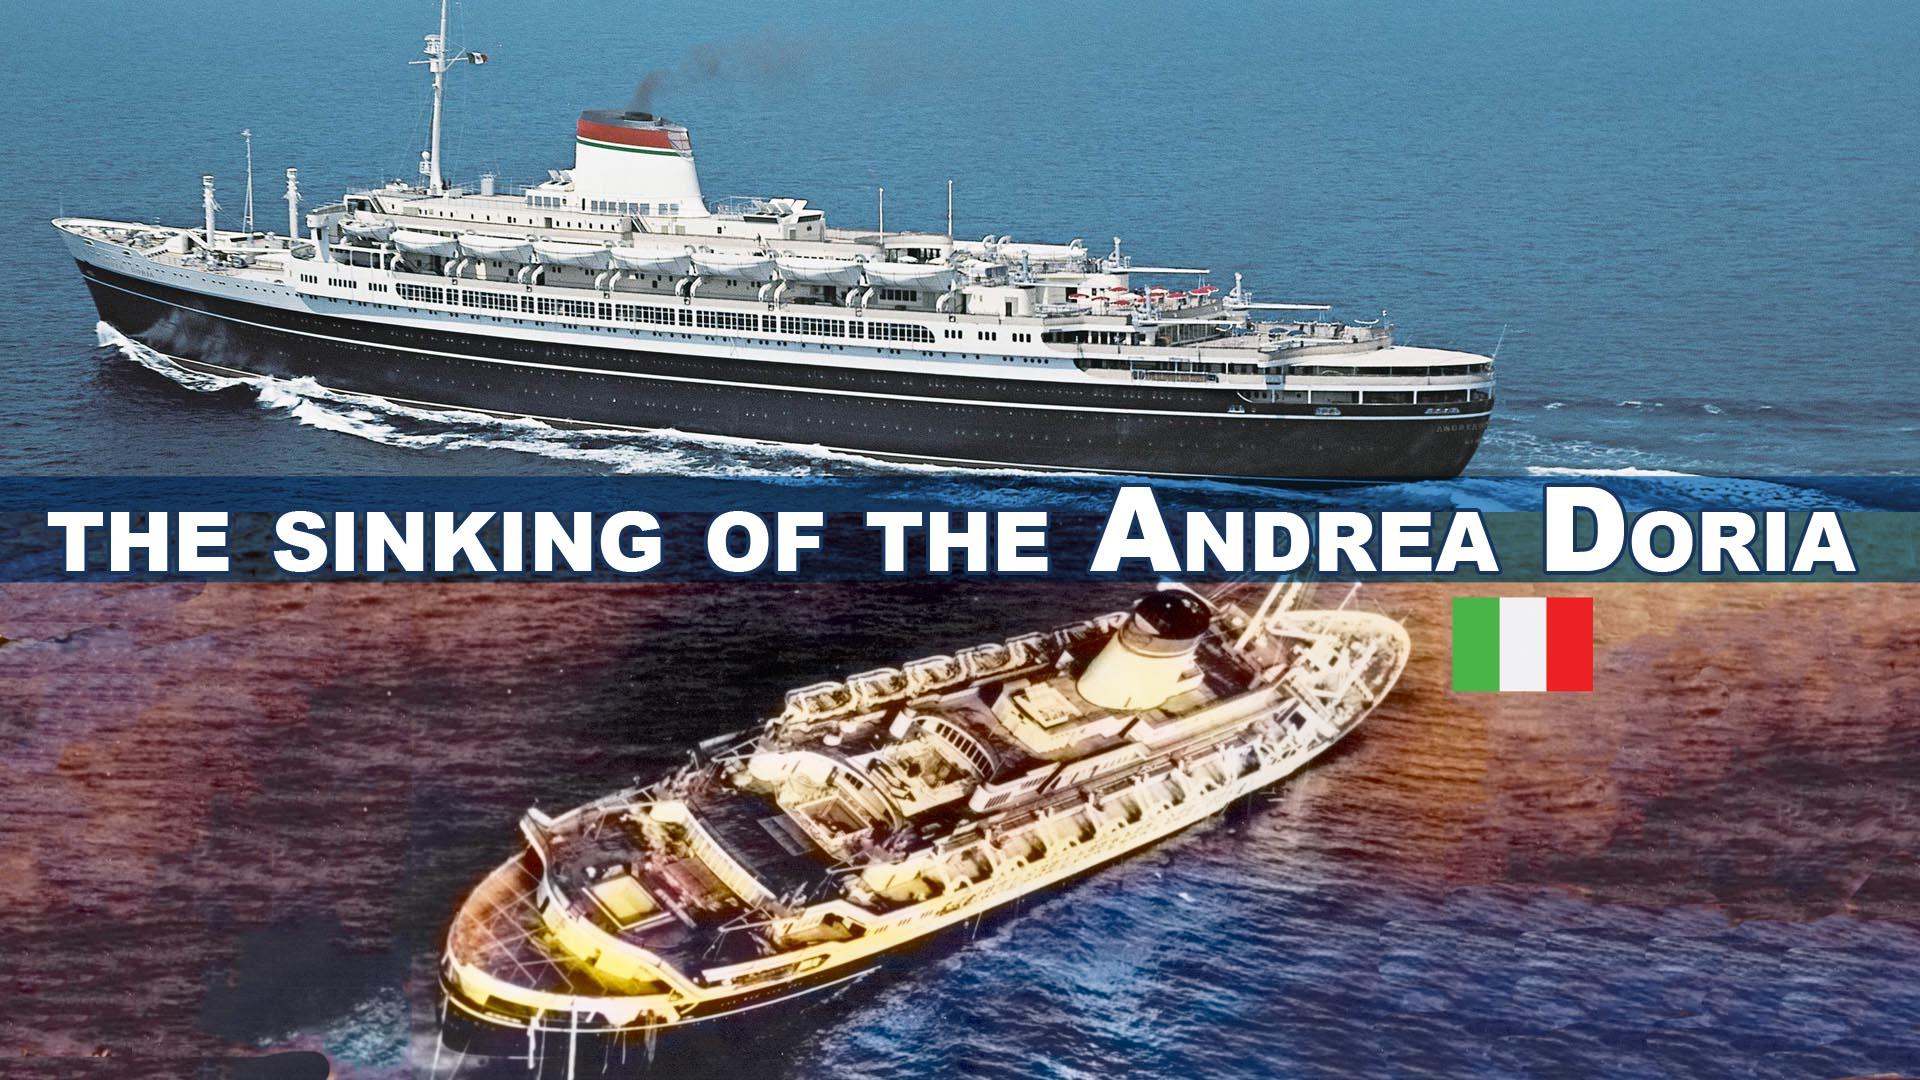 The Sinking of the Andrea Doria -